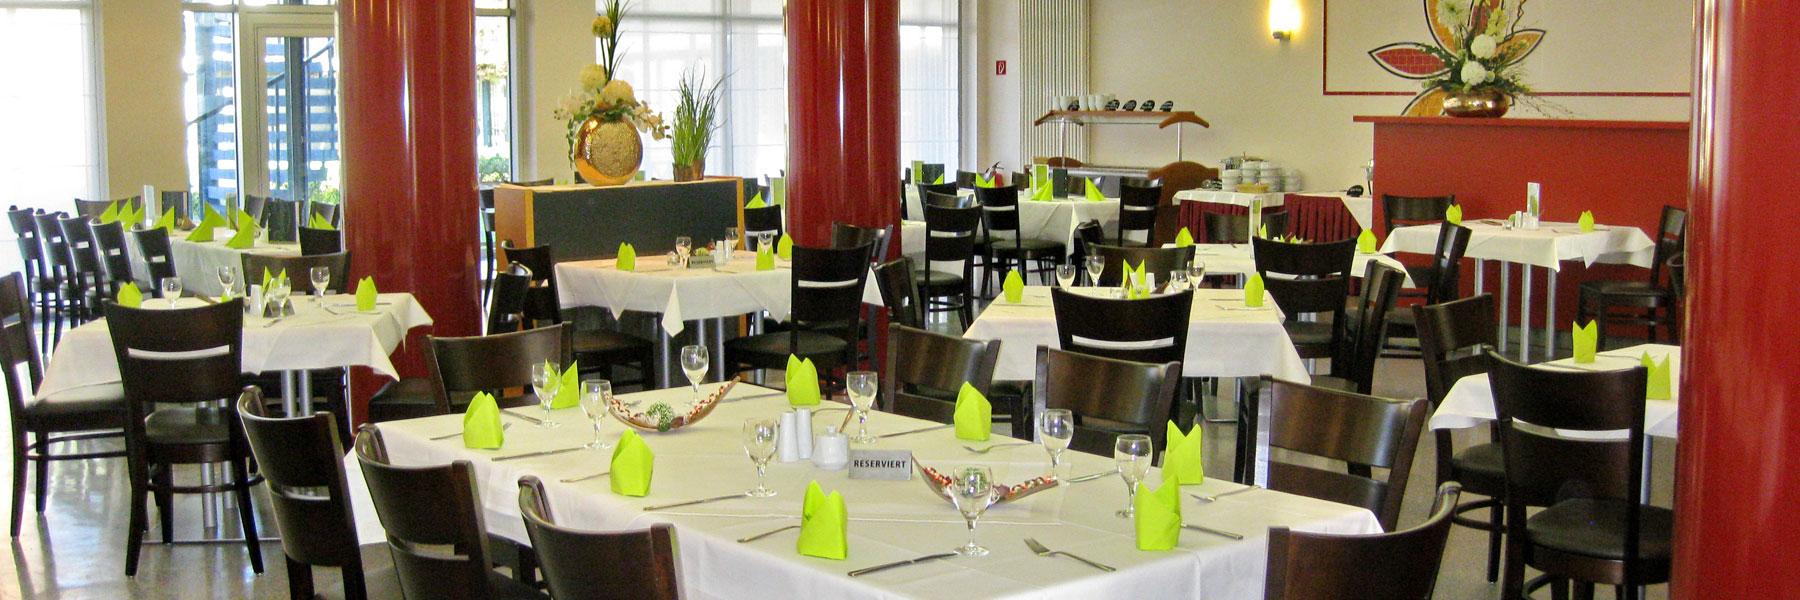 Restaurant - VCH-Hotel Greifswald